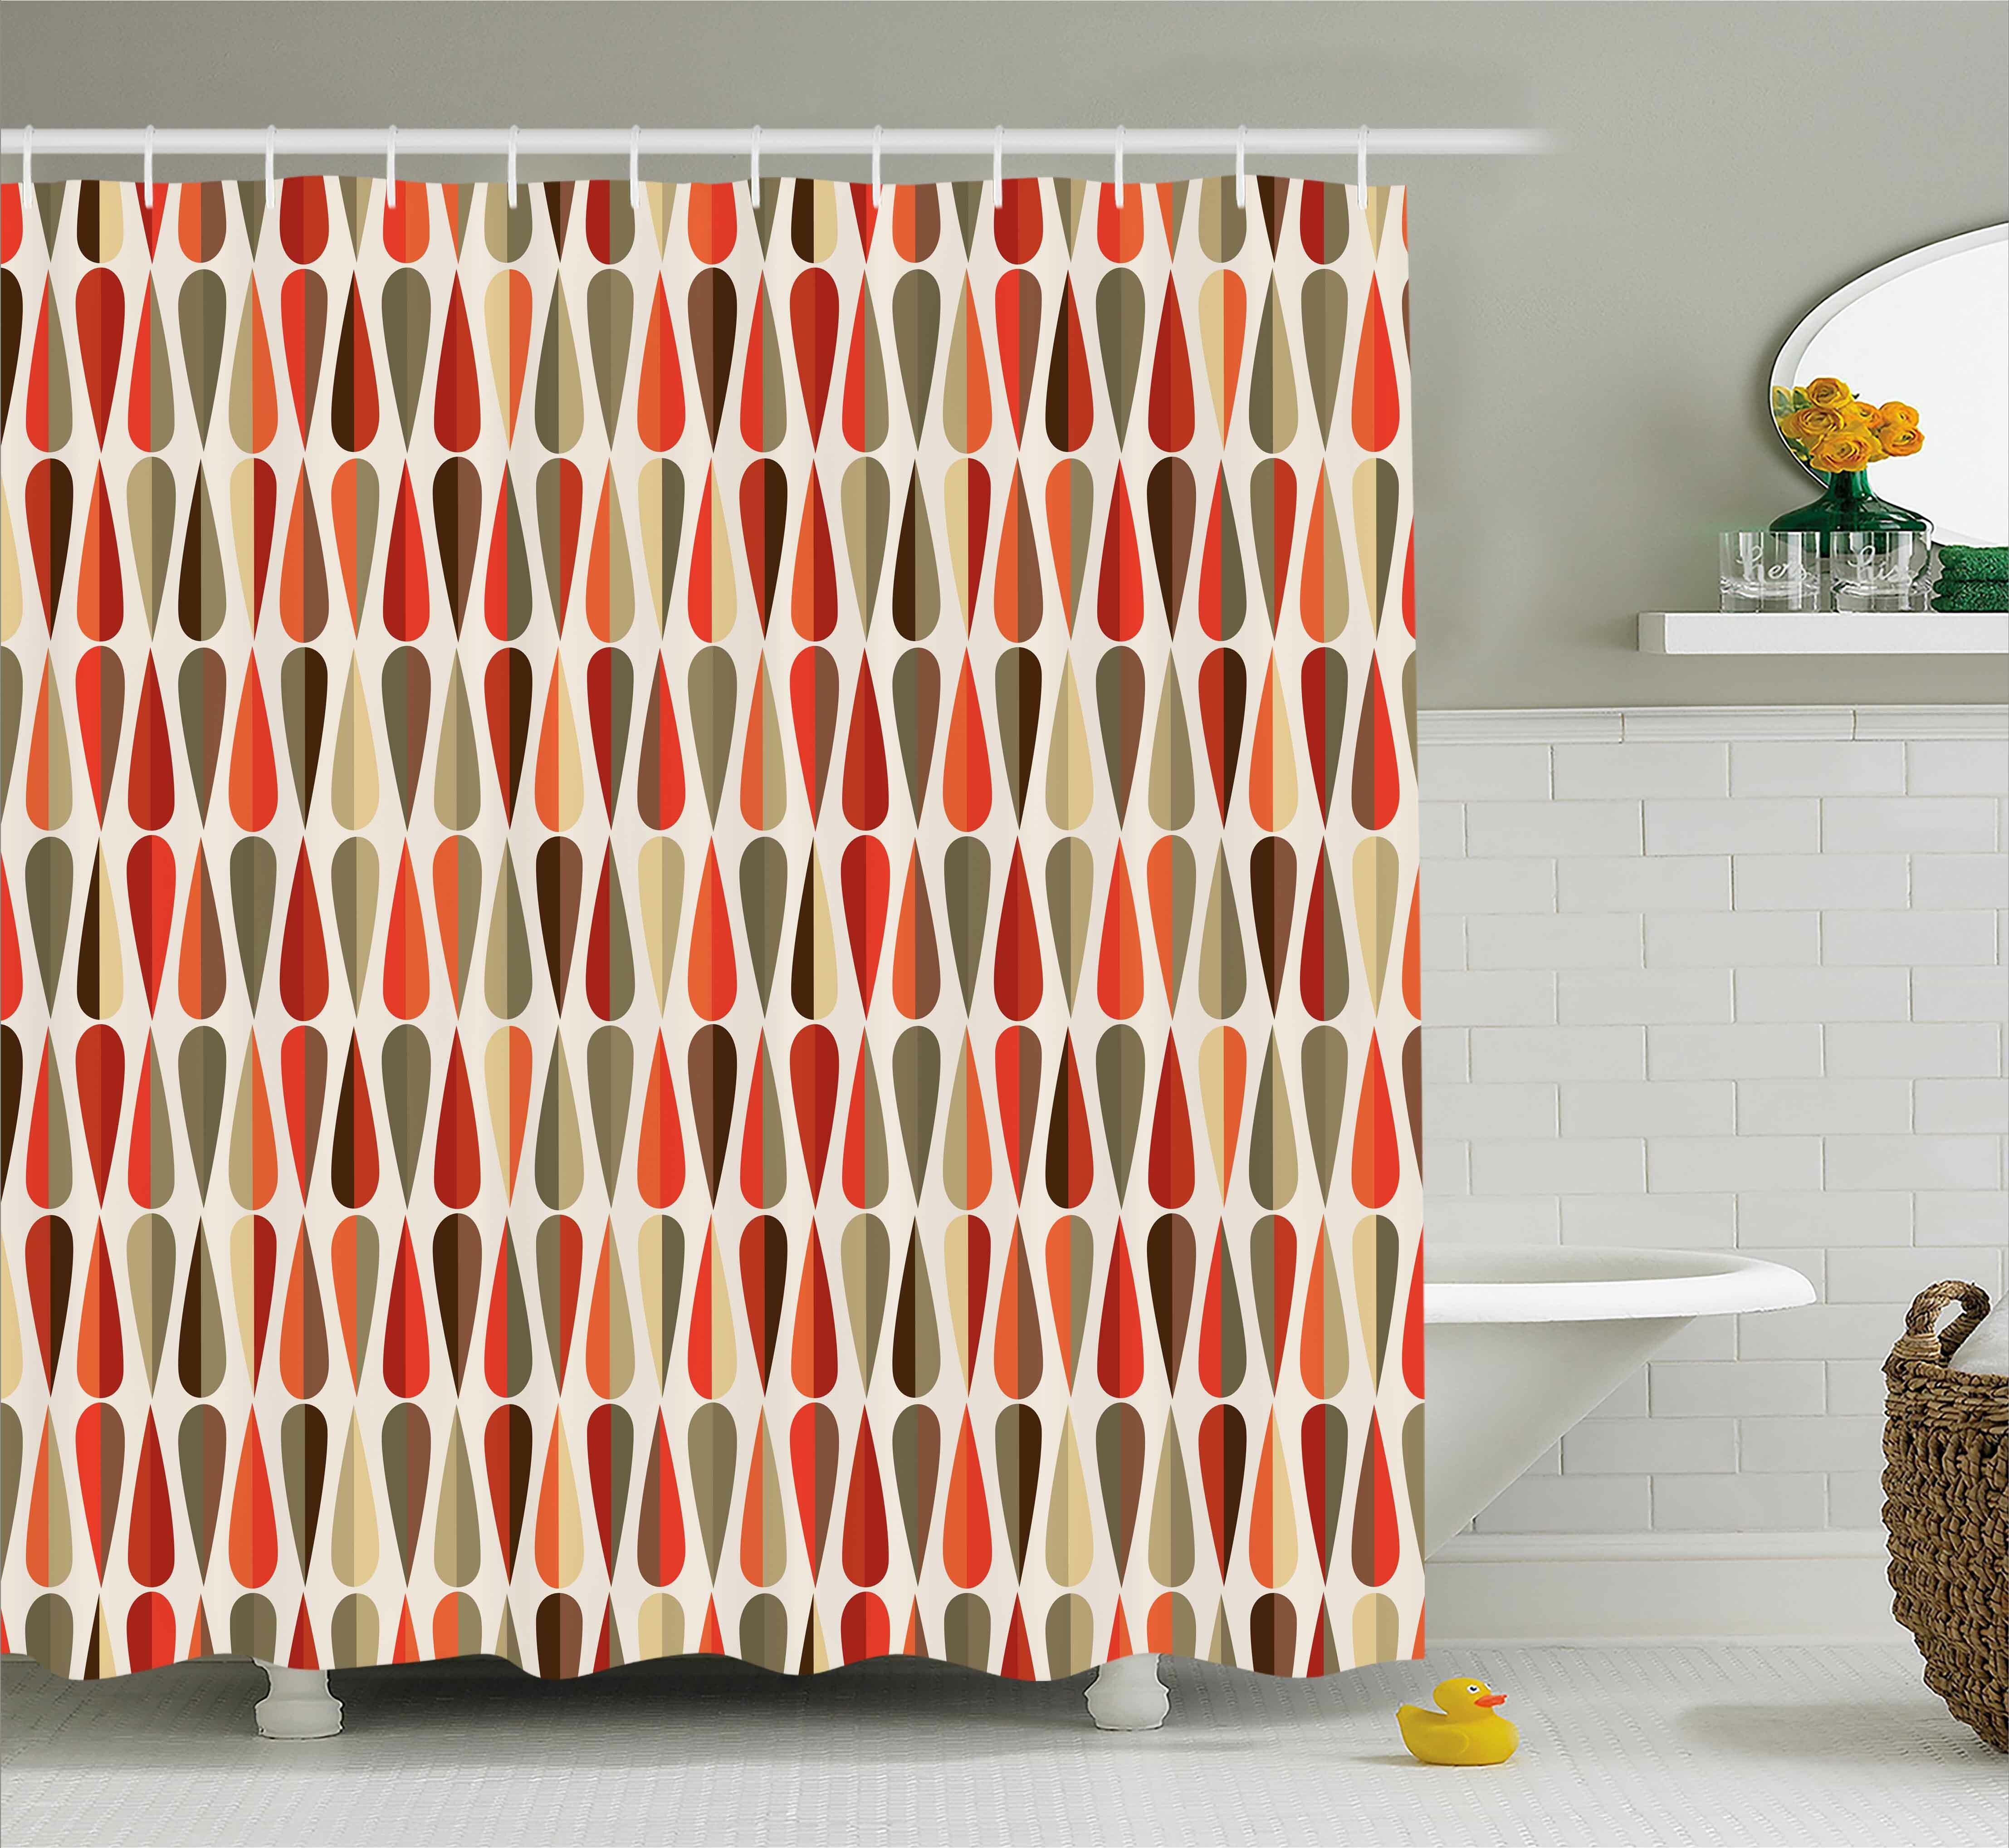 Ivy Bronx Alexander Retro Home Decor 60s 70s Style Geometric Round Shaped Design With Warm Colors Print Single Shower Curtain Wayfair